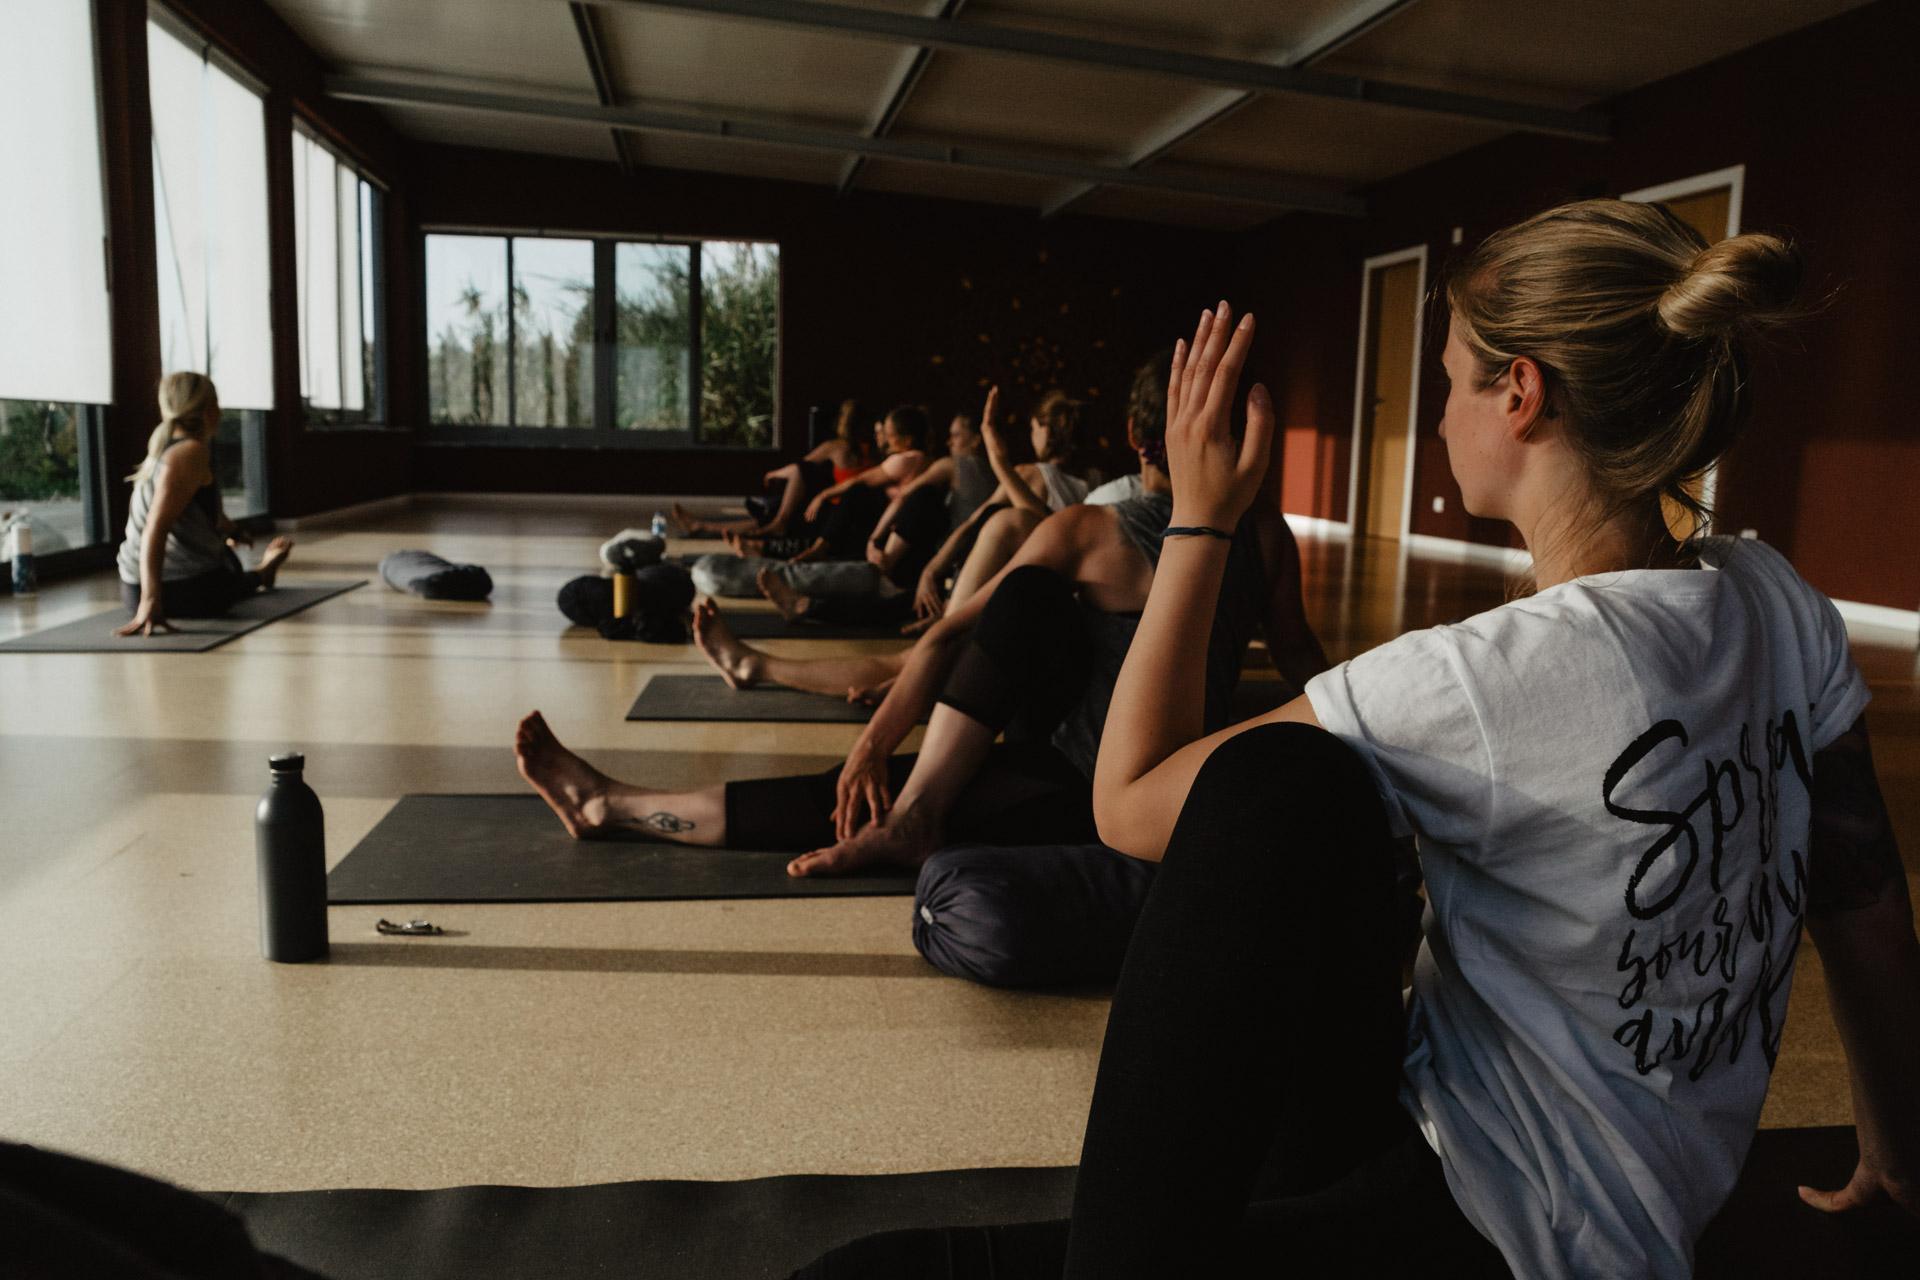 Yoga-Yogamatten-Yogakurs.jpg